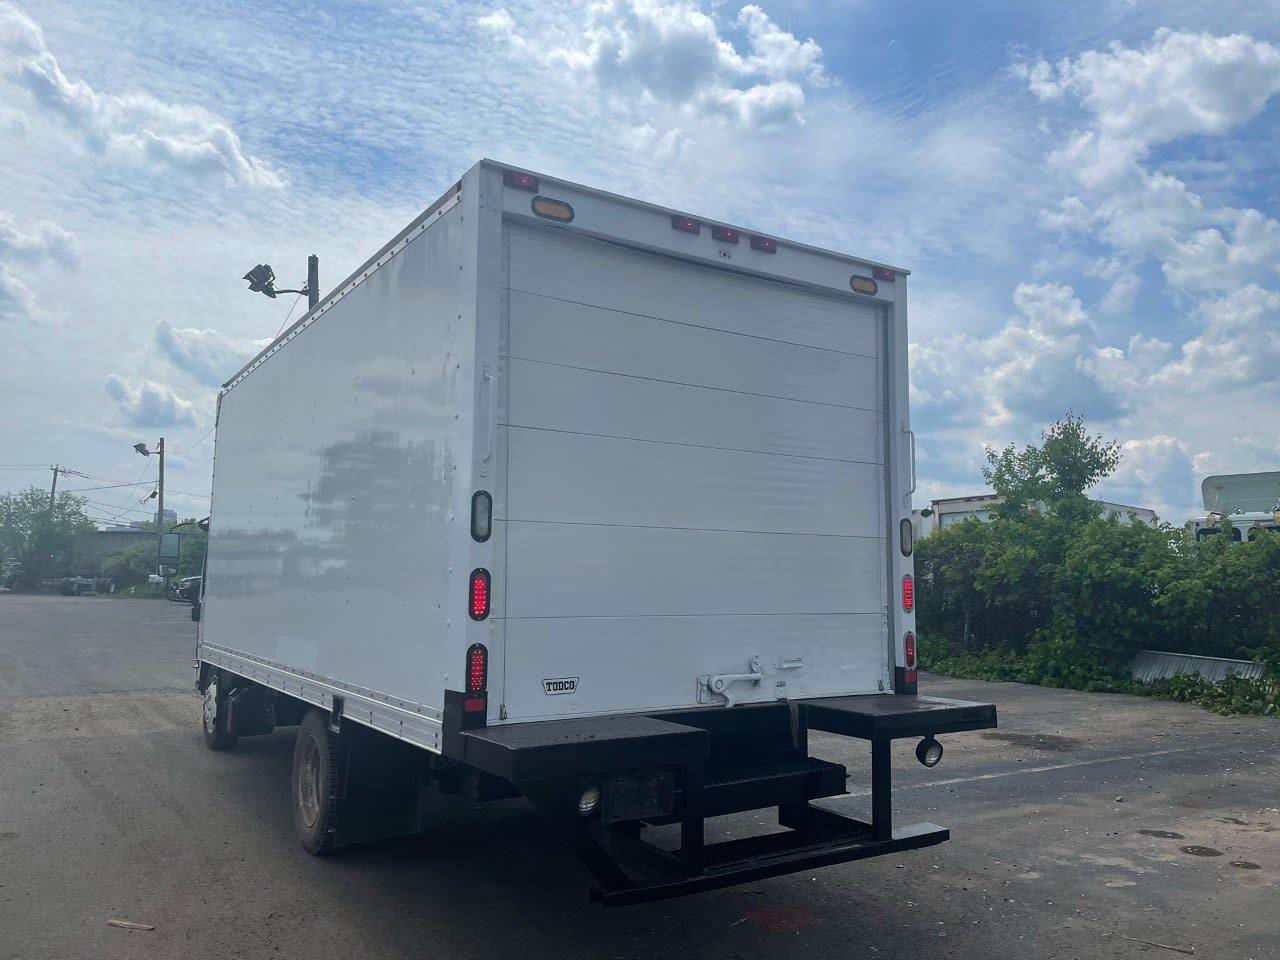 2015 Isuzu NQR Regular Cab 4x2, Dry Freight #650512 - photo 1